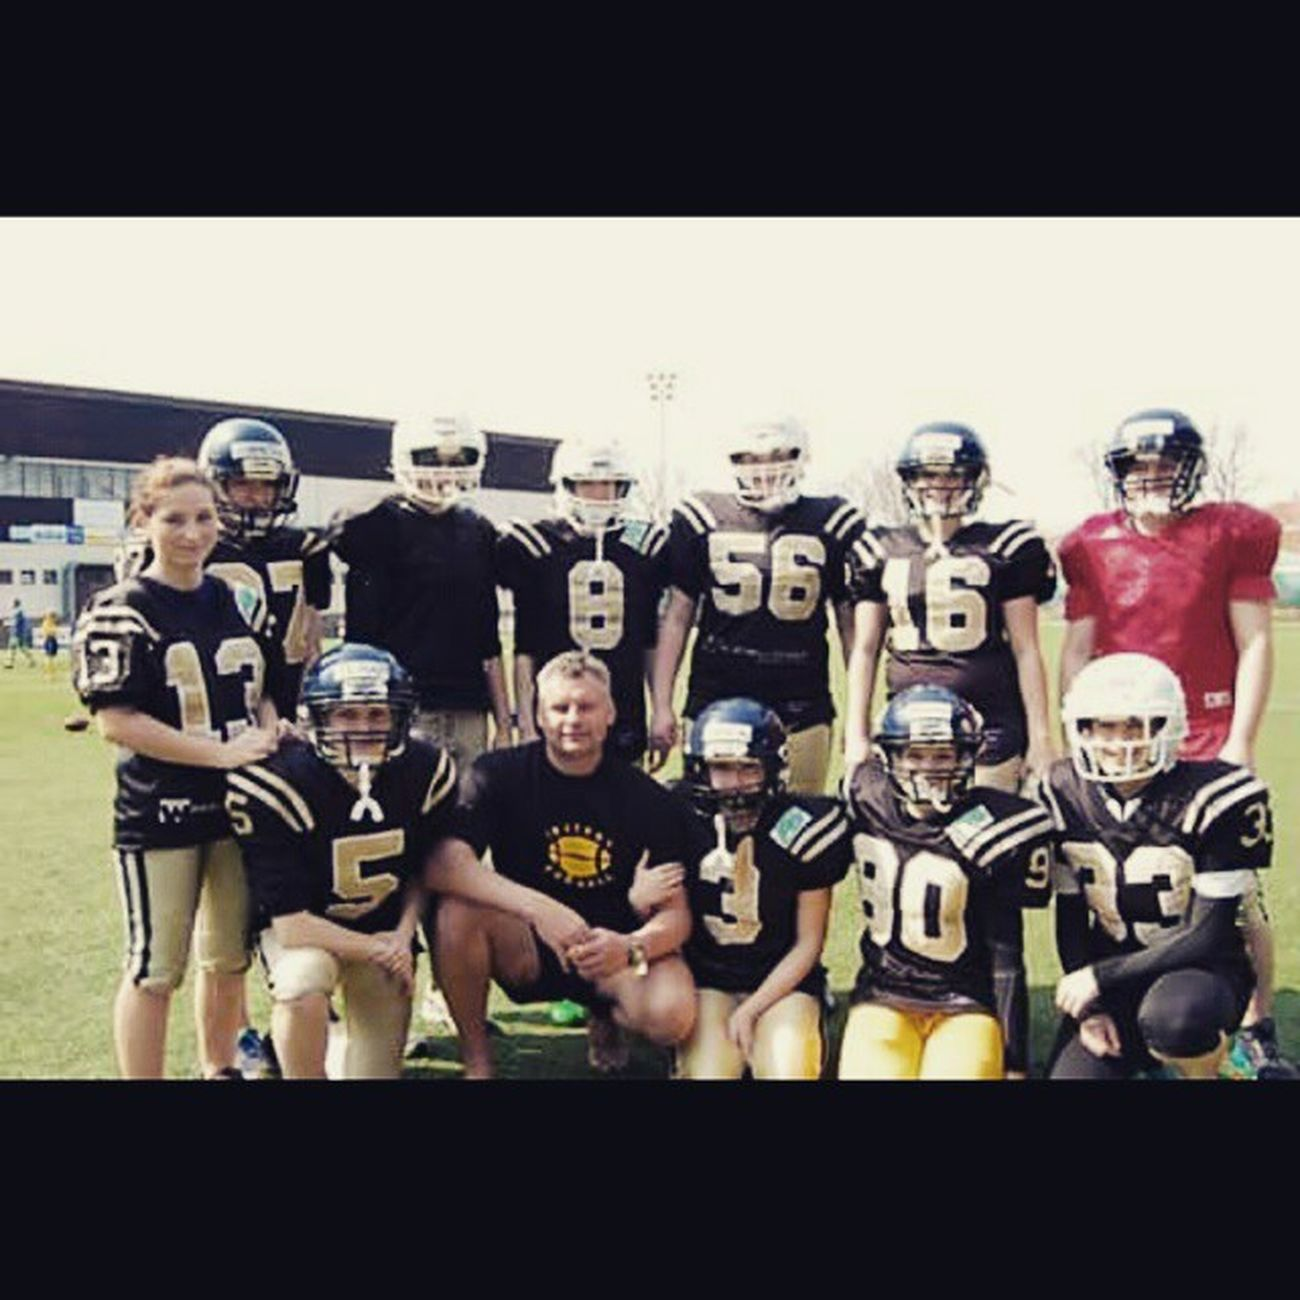 Americanfootballplayers Americanfootballgirls GoLigers 💪🏈